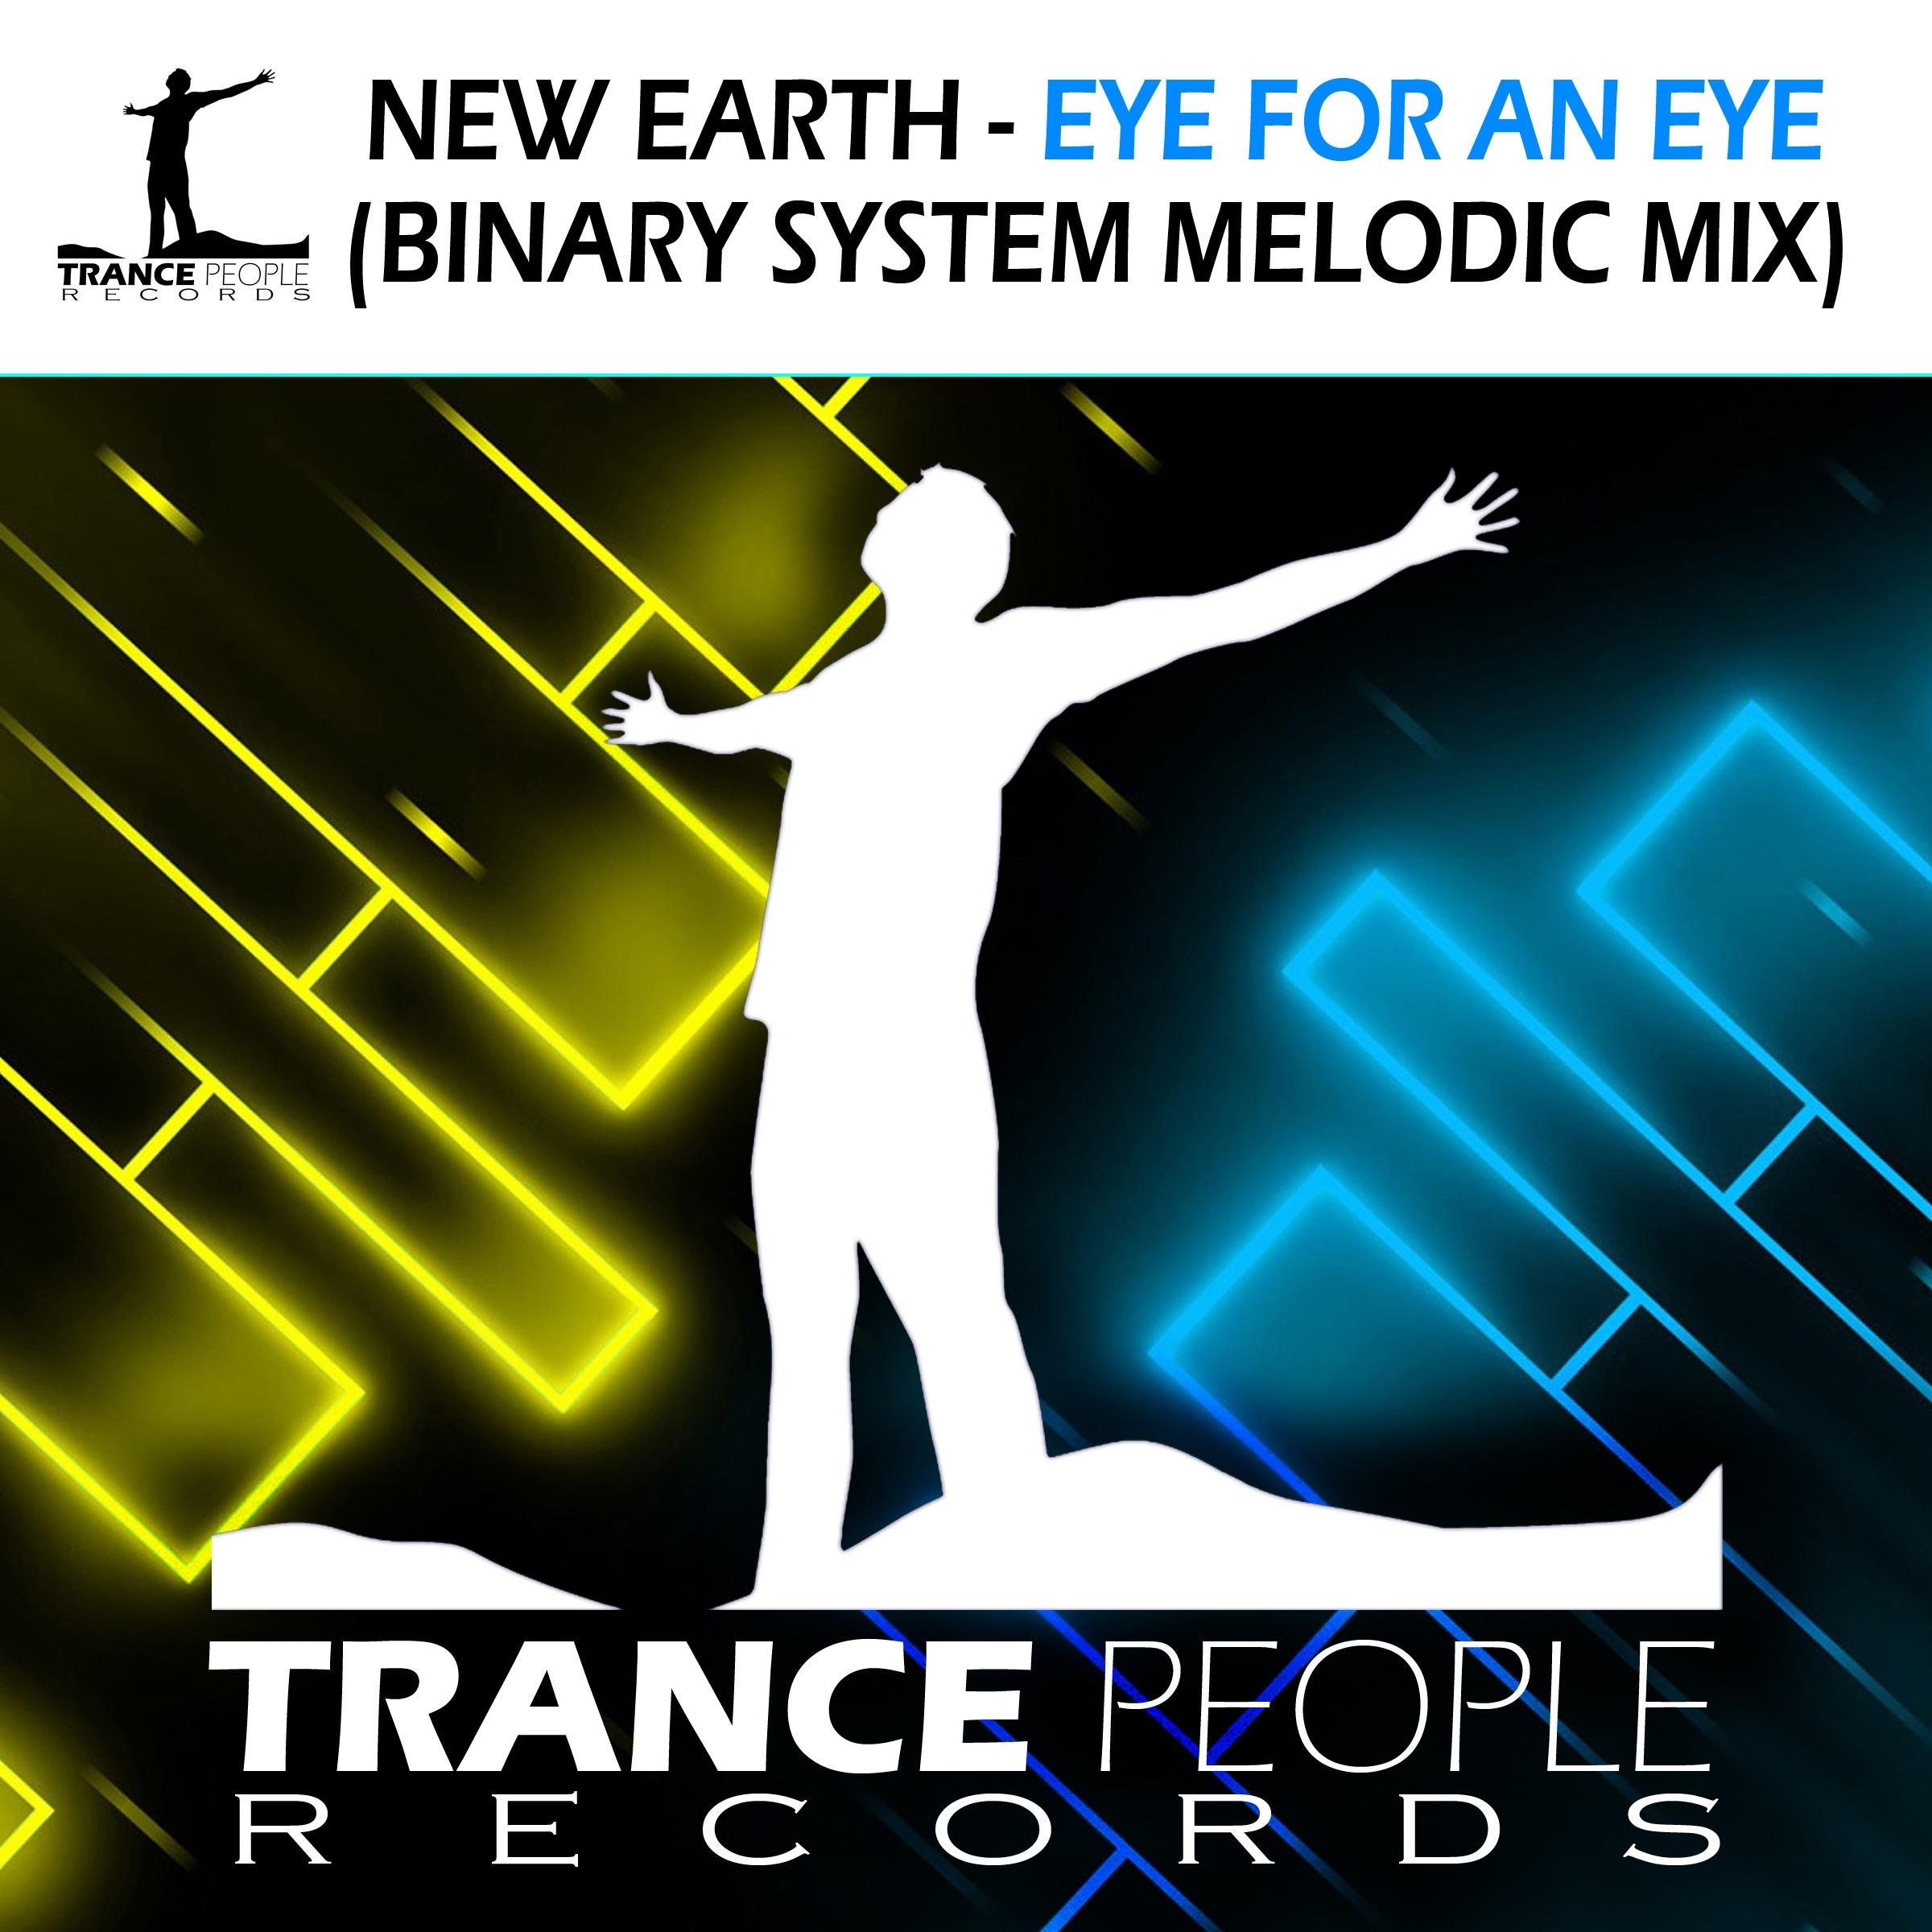 Eye for an Eye (Binary System Melodic Mix) - Single